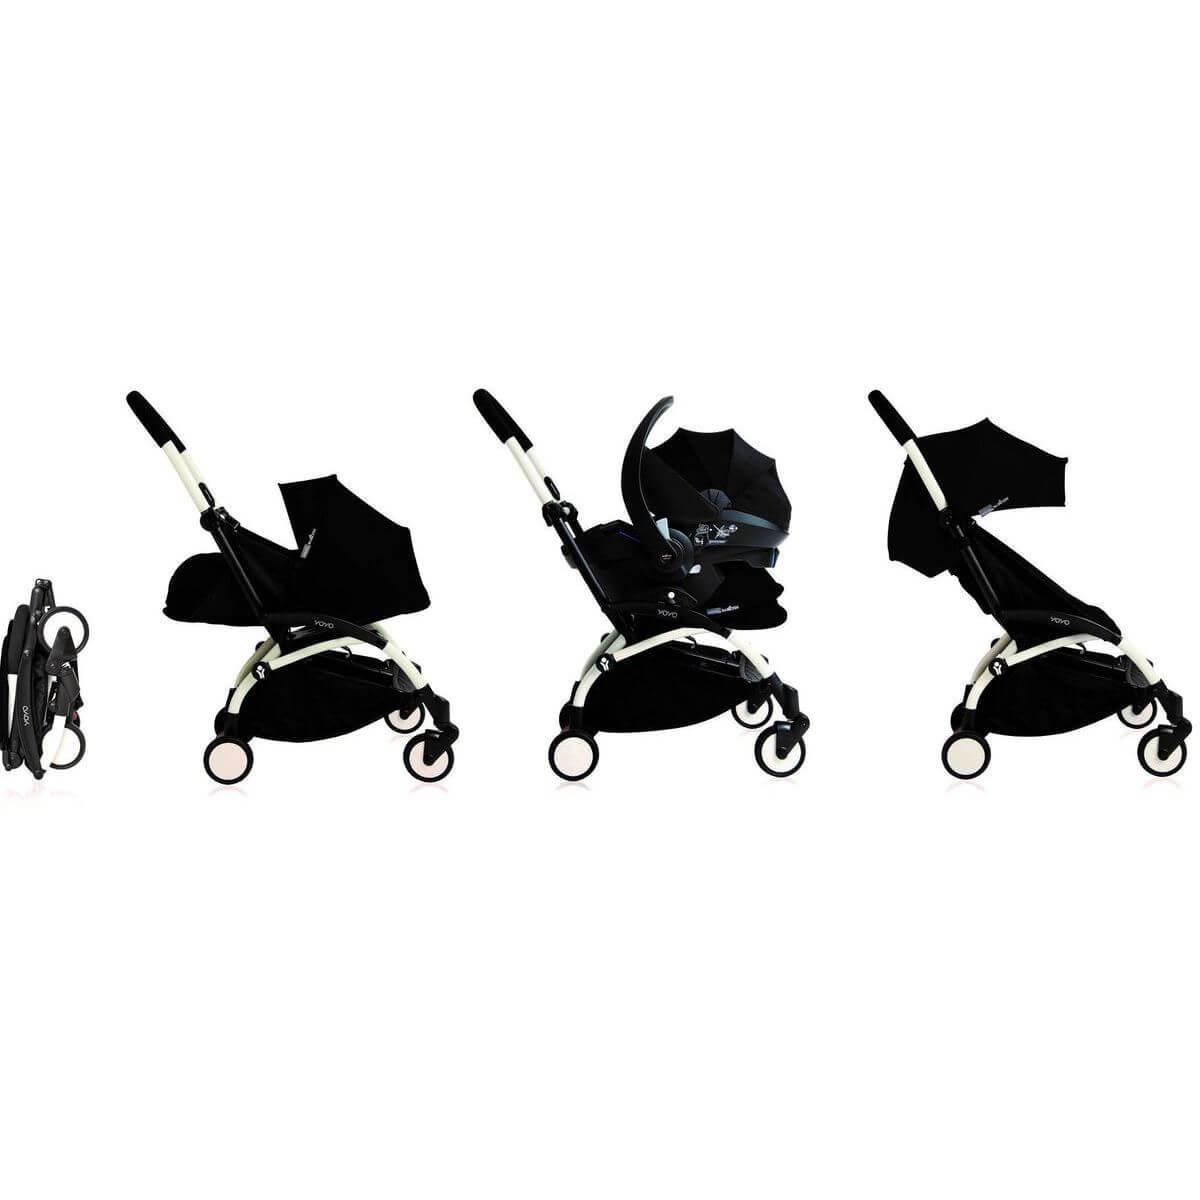 Silla paseo bebé YOYO+ 0+ Babyzen blanco-negro